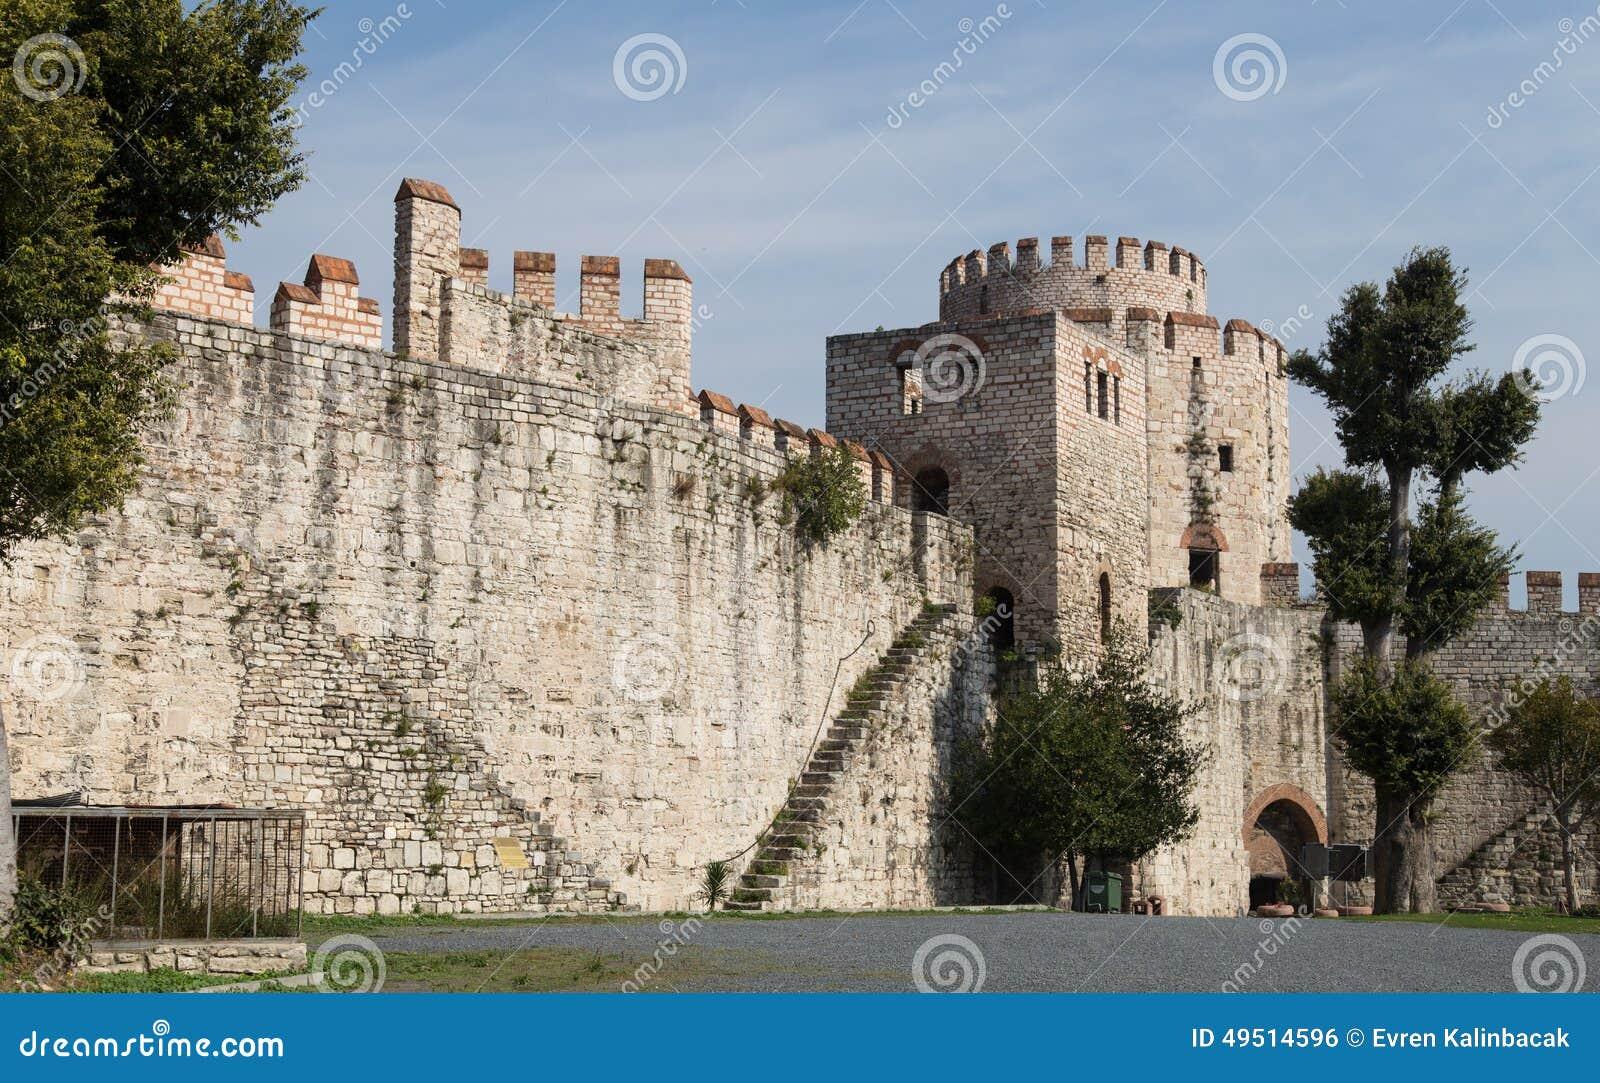 Yedikule Fortress Stock Photo - Image: 49514596